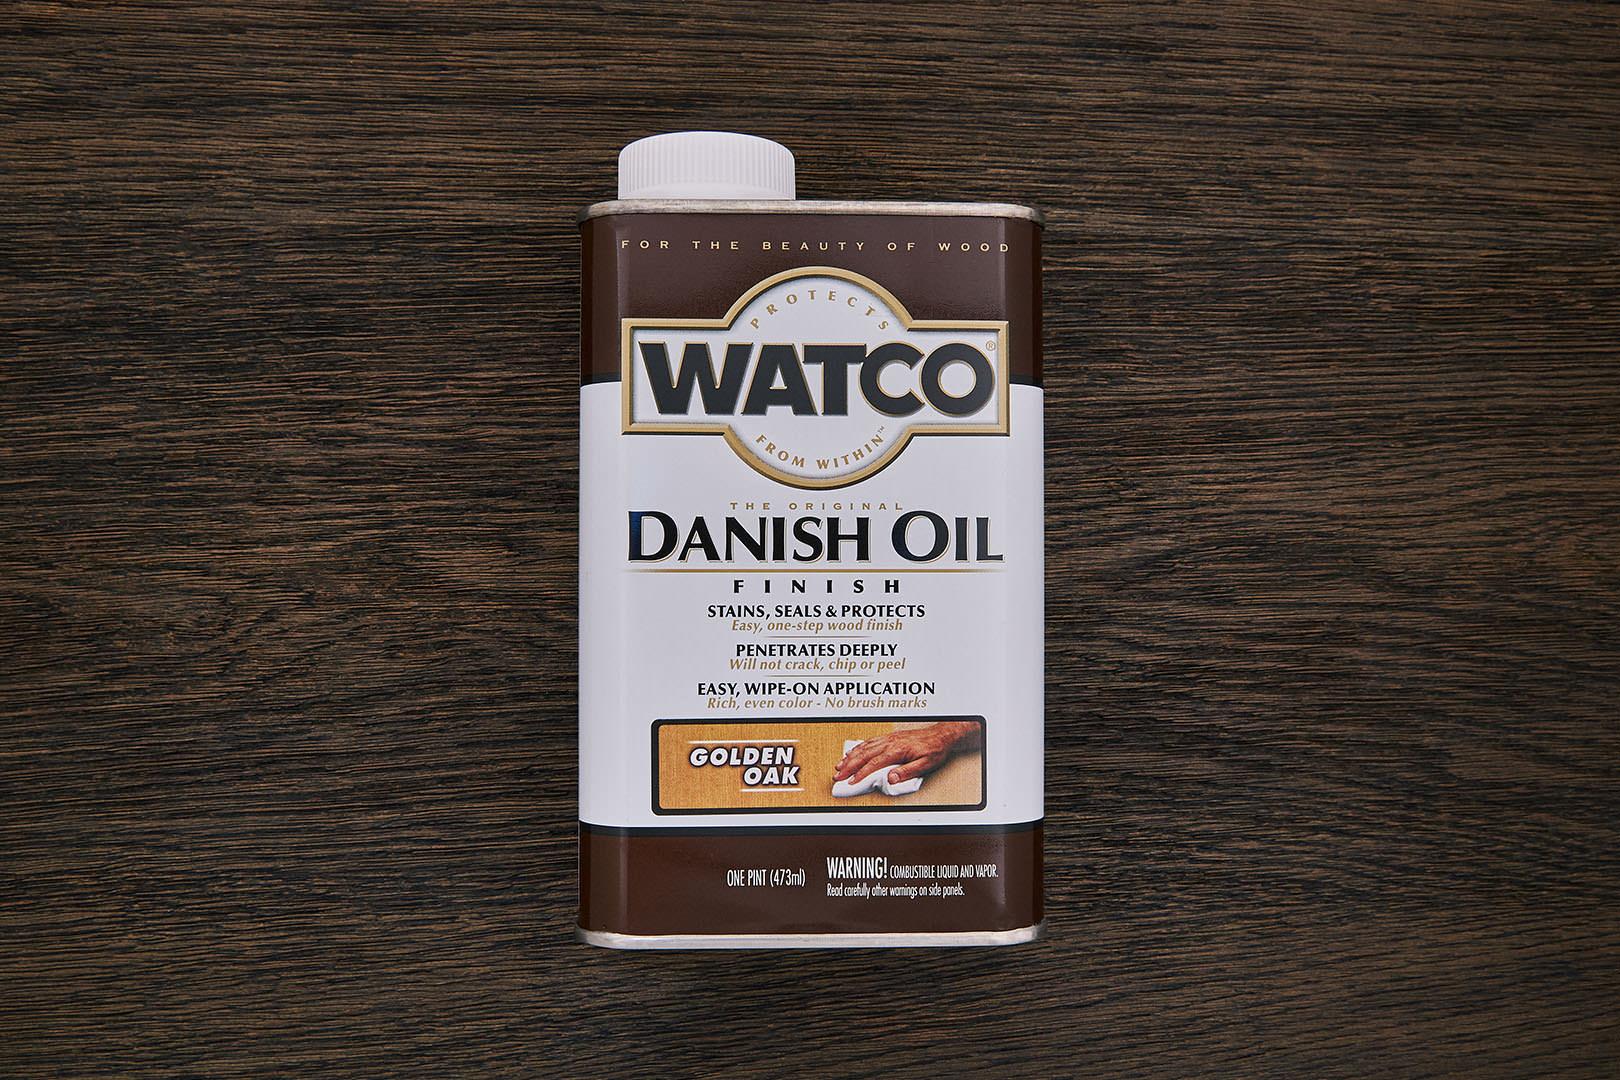 Фото датского масла